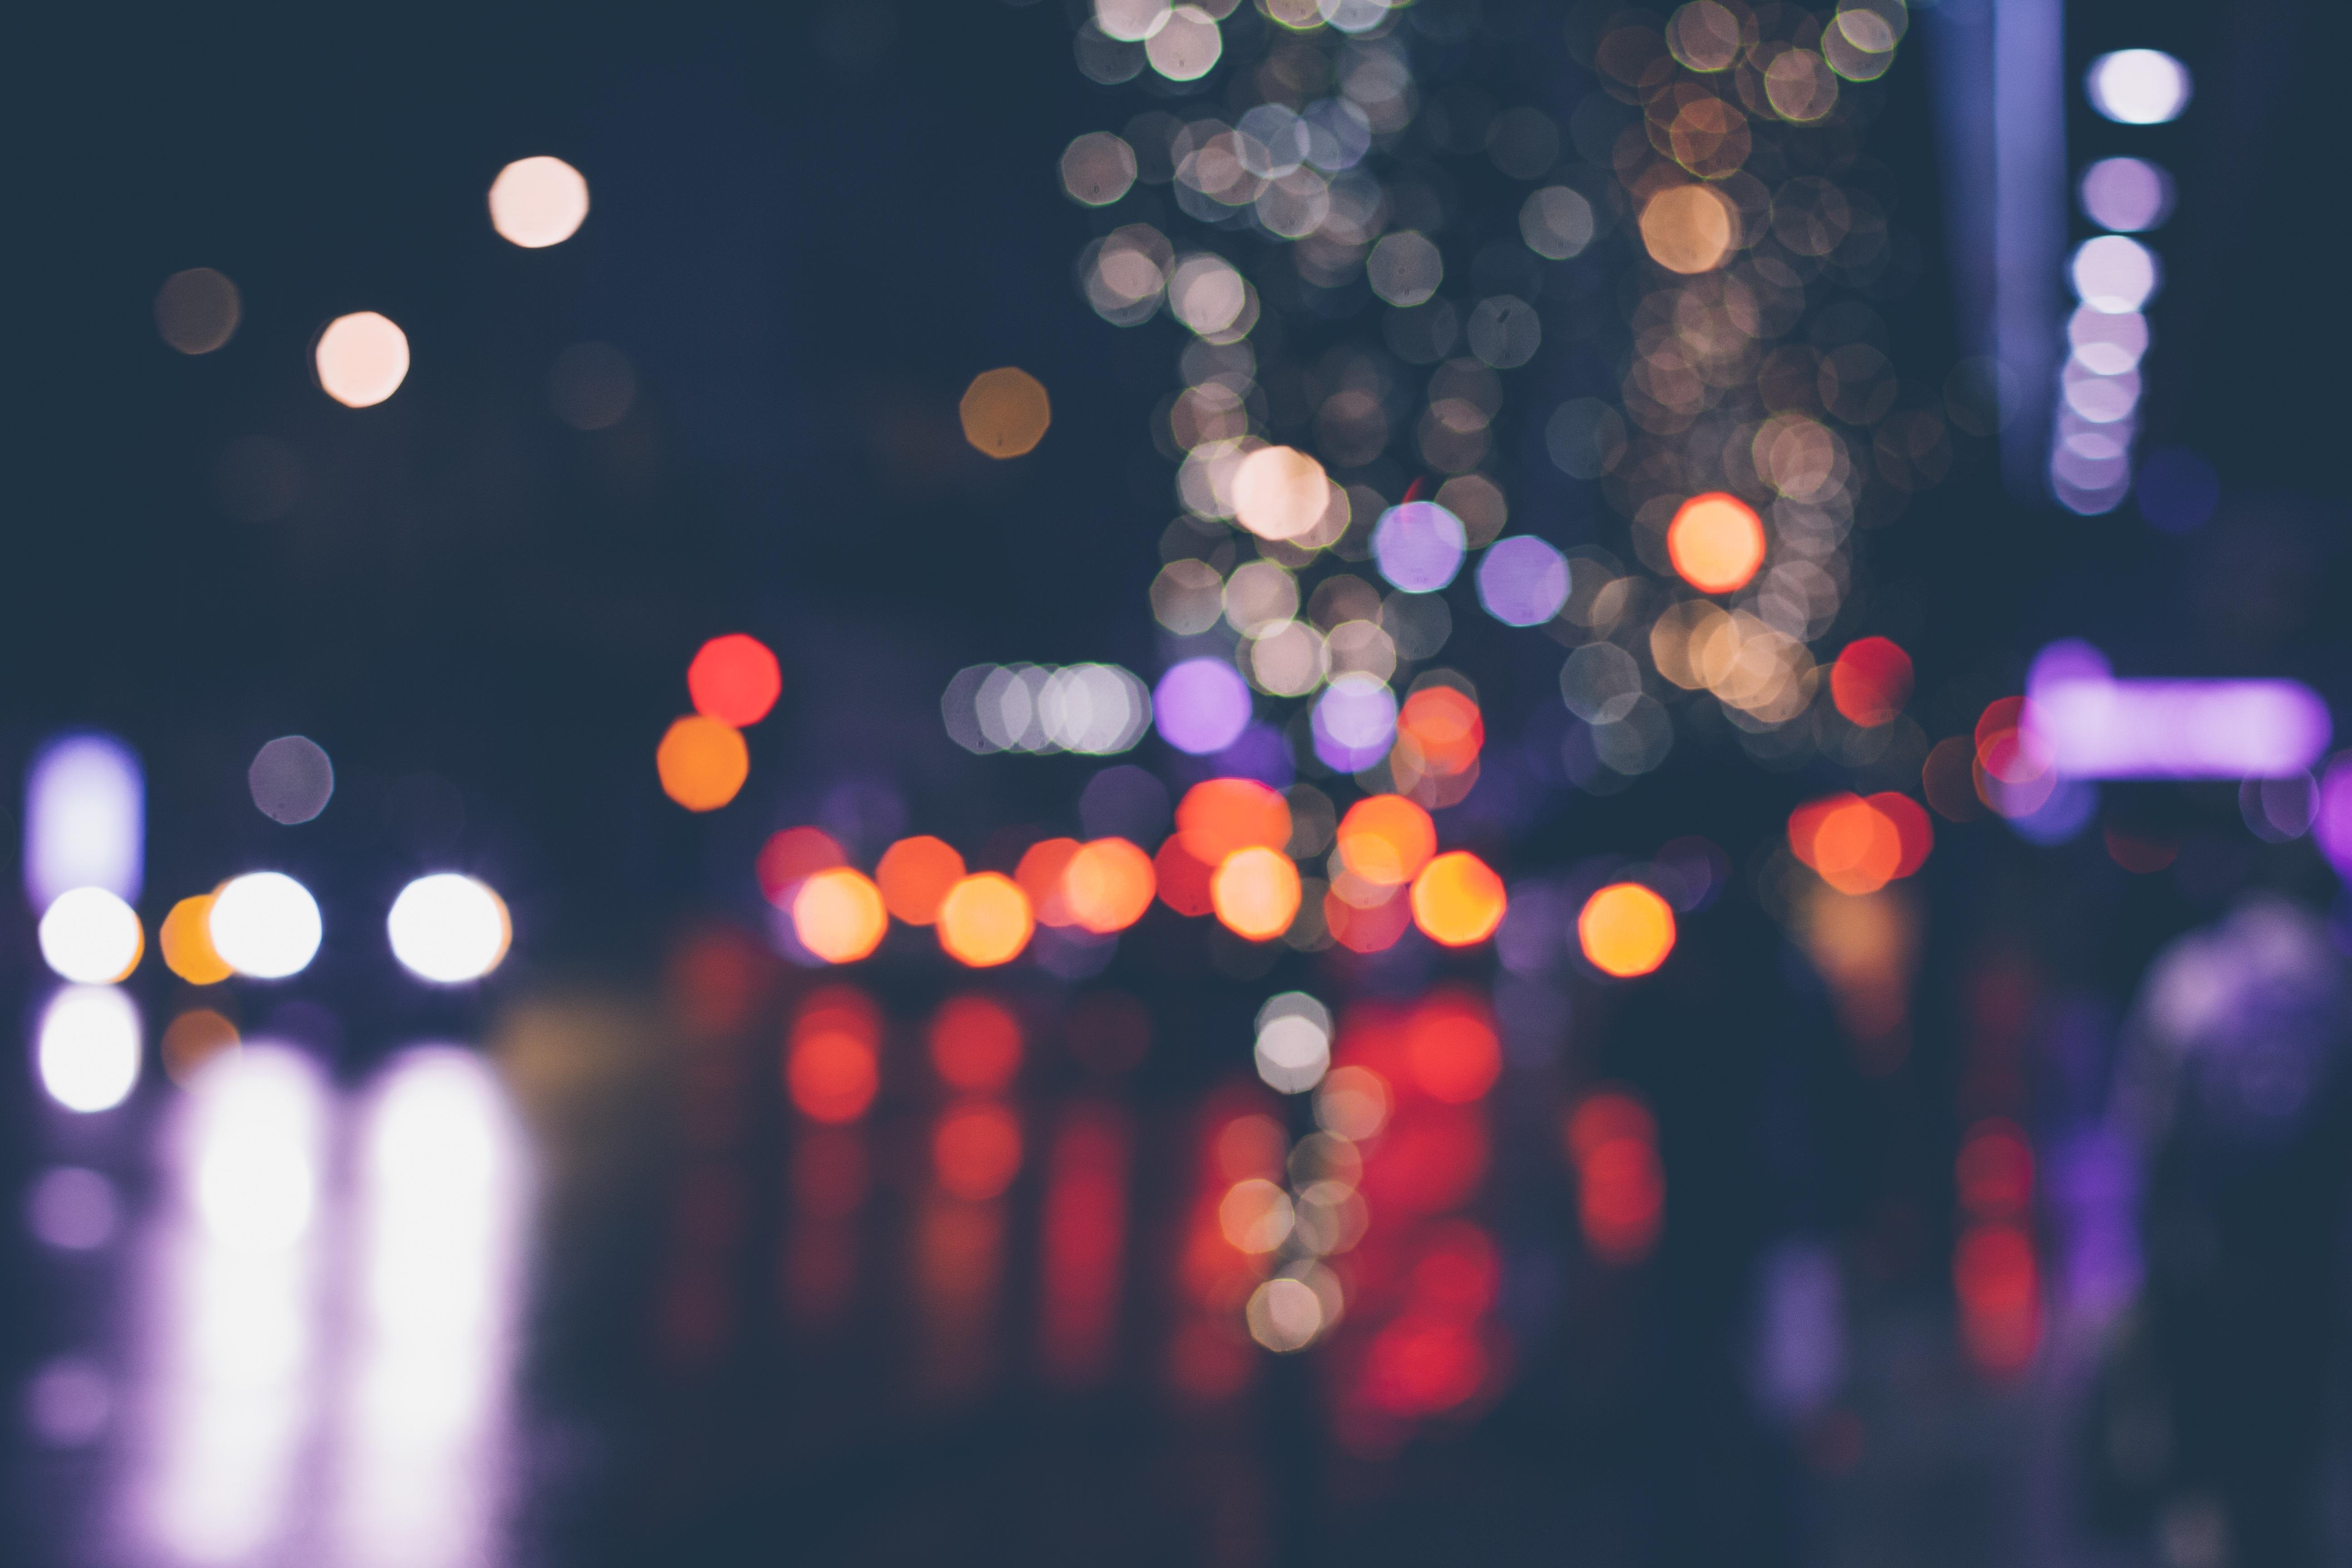 light-traffic-night-round-wet-city-717940-pxhere.com